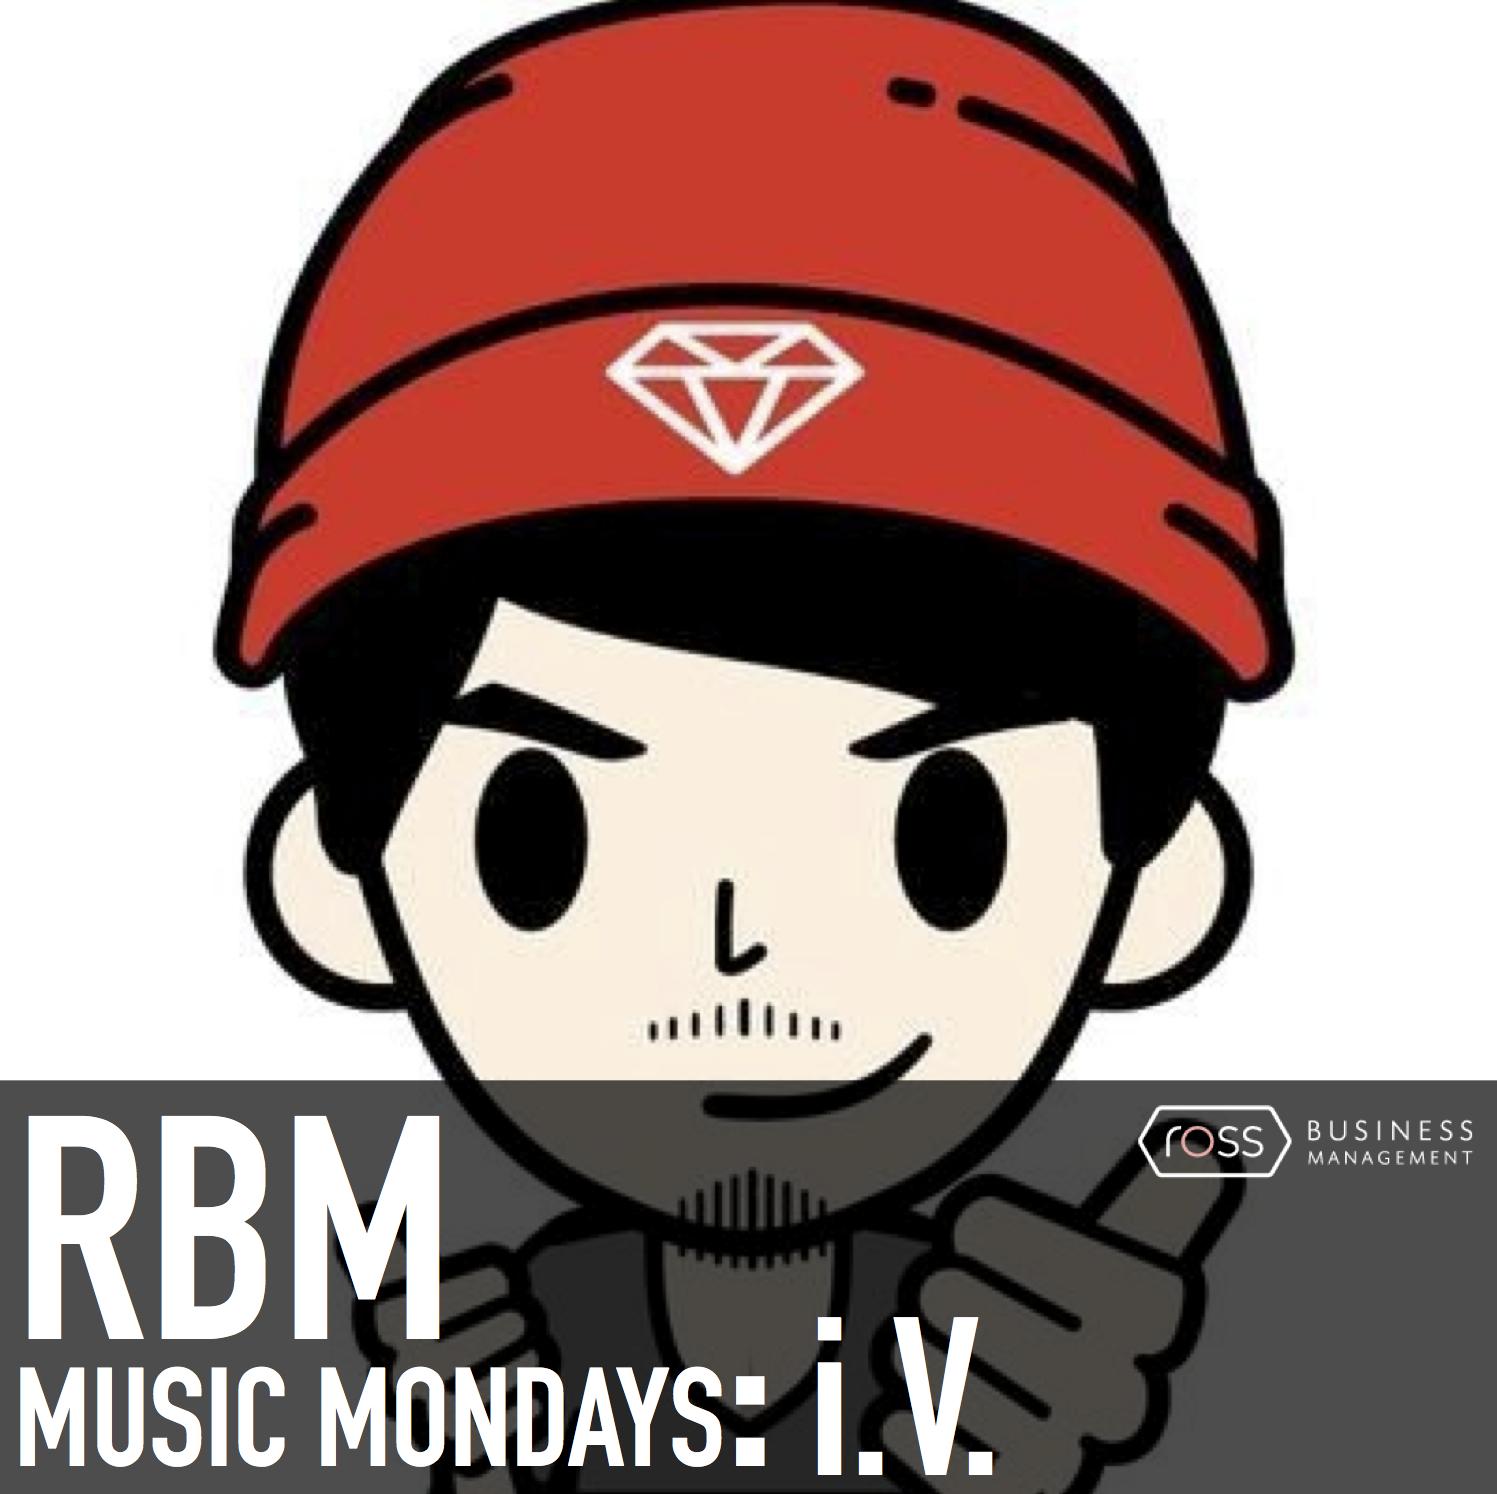 RBM-Music-Monday-Templatei.jpg